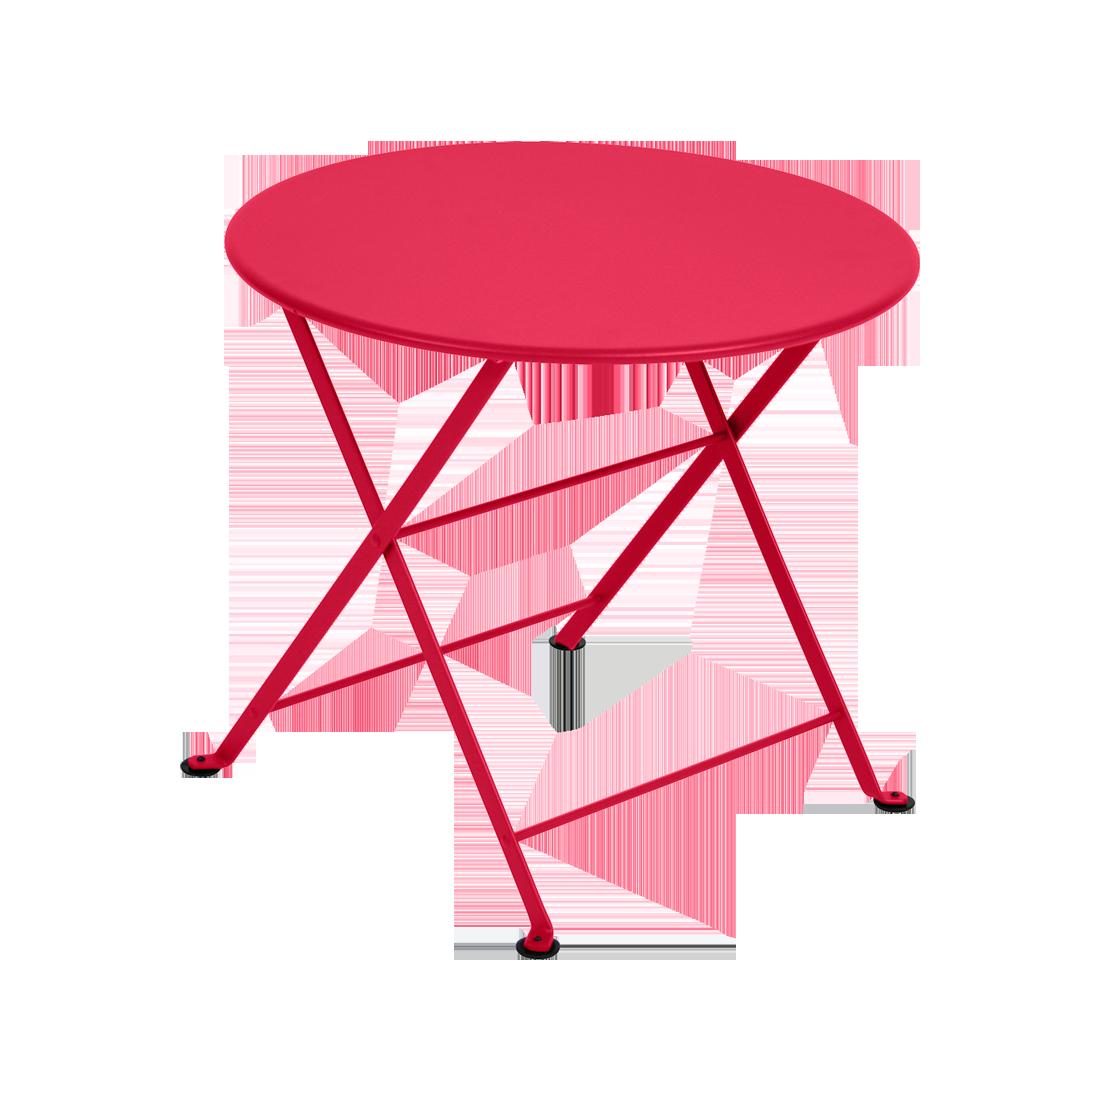 table basse metal, petite table basse, table metal enfant, table de jardin pour enfant, table enfant rose